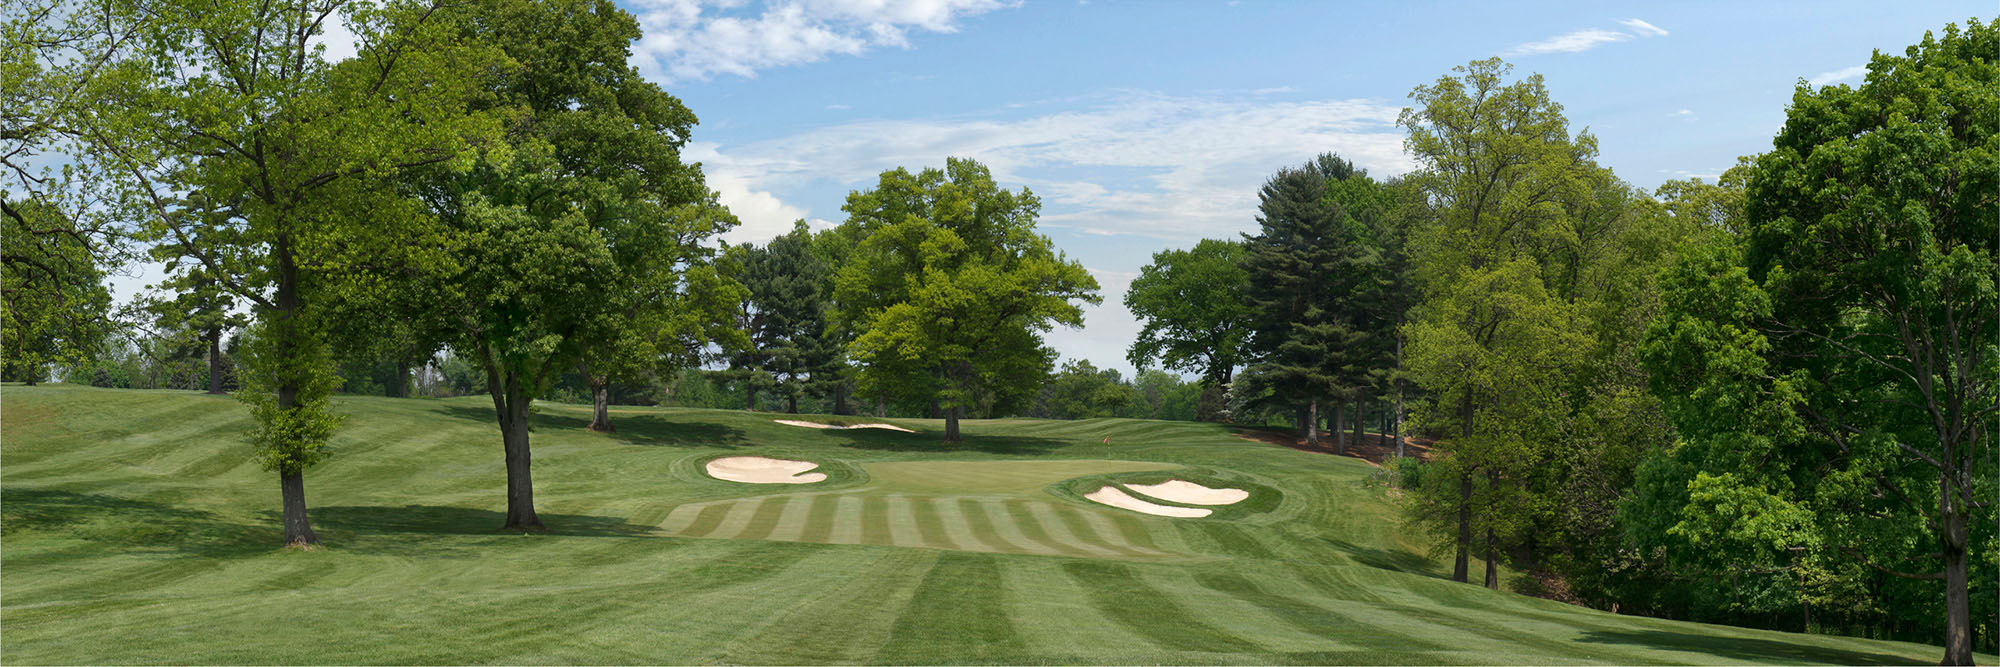 Golf Course Image - Lehigh Country Club No. 3